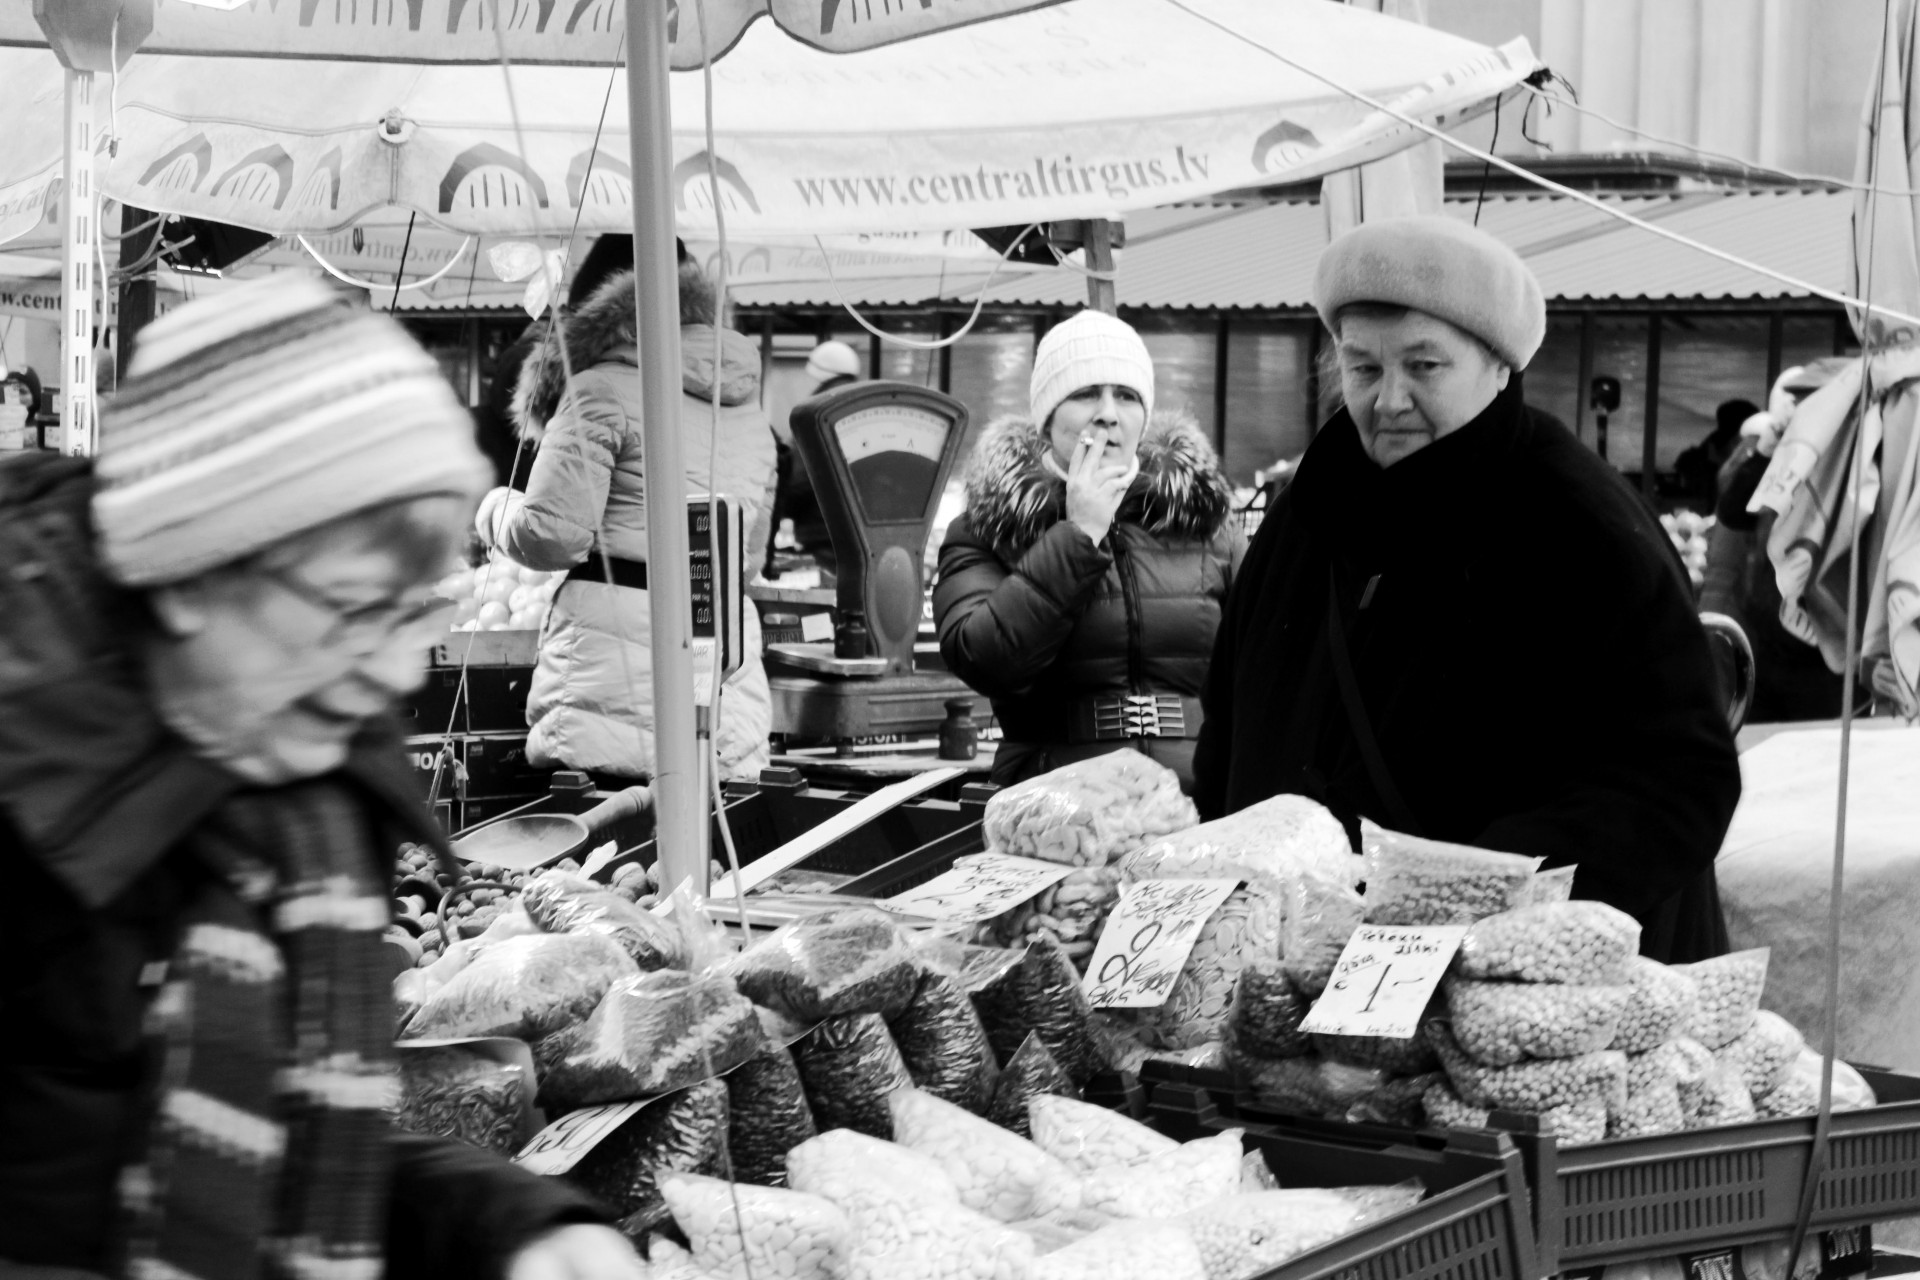 veraKoh. People from Riga